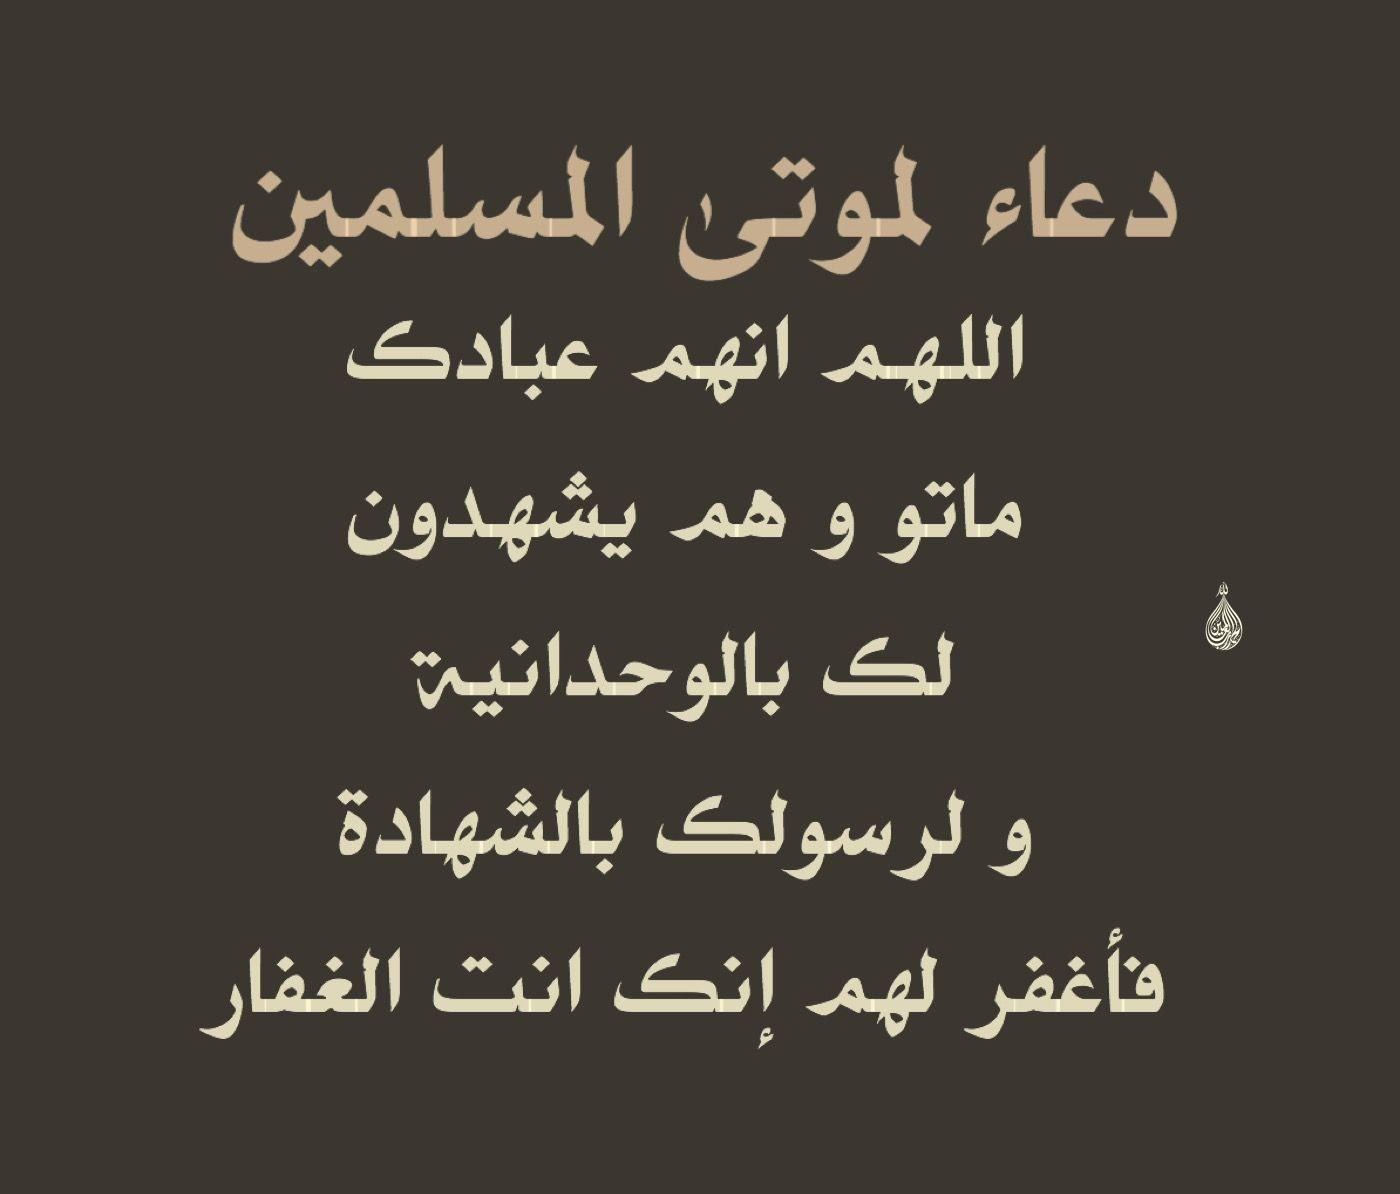 Pin By Asma On اللهم ارحم أموات المسلمين Calligraphy Arabic Calligraphy Arabic